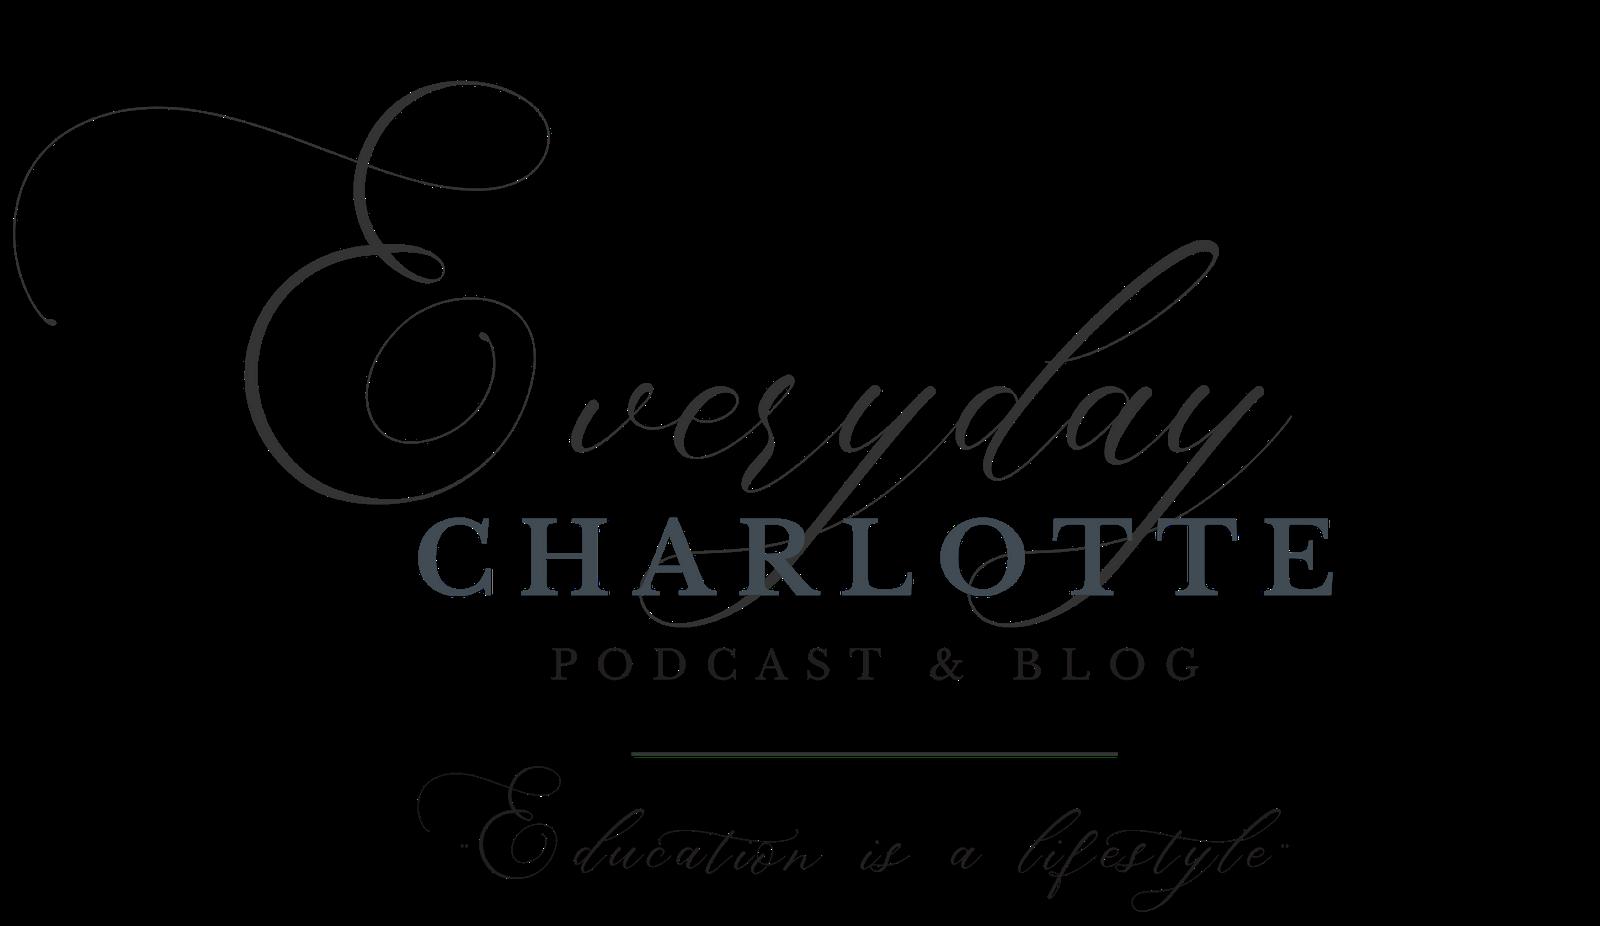 Everyday Charlotte